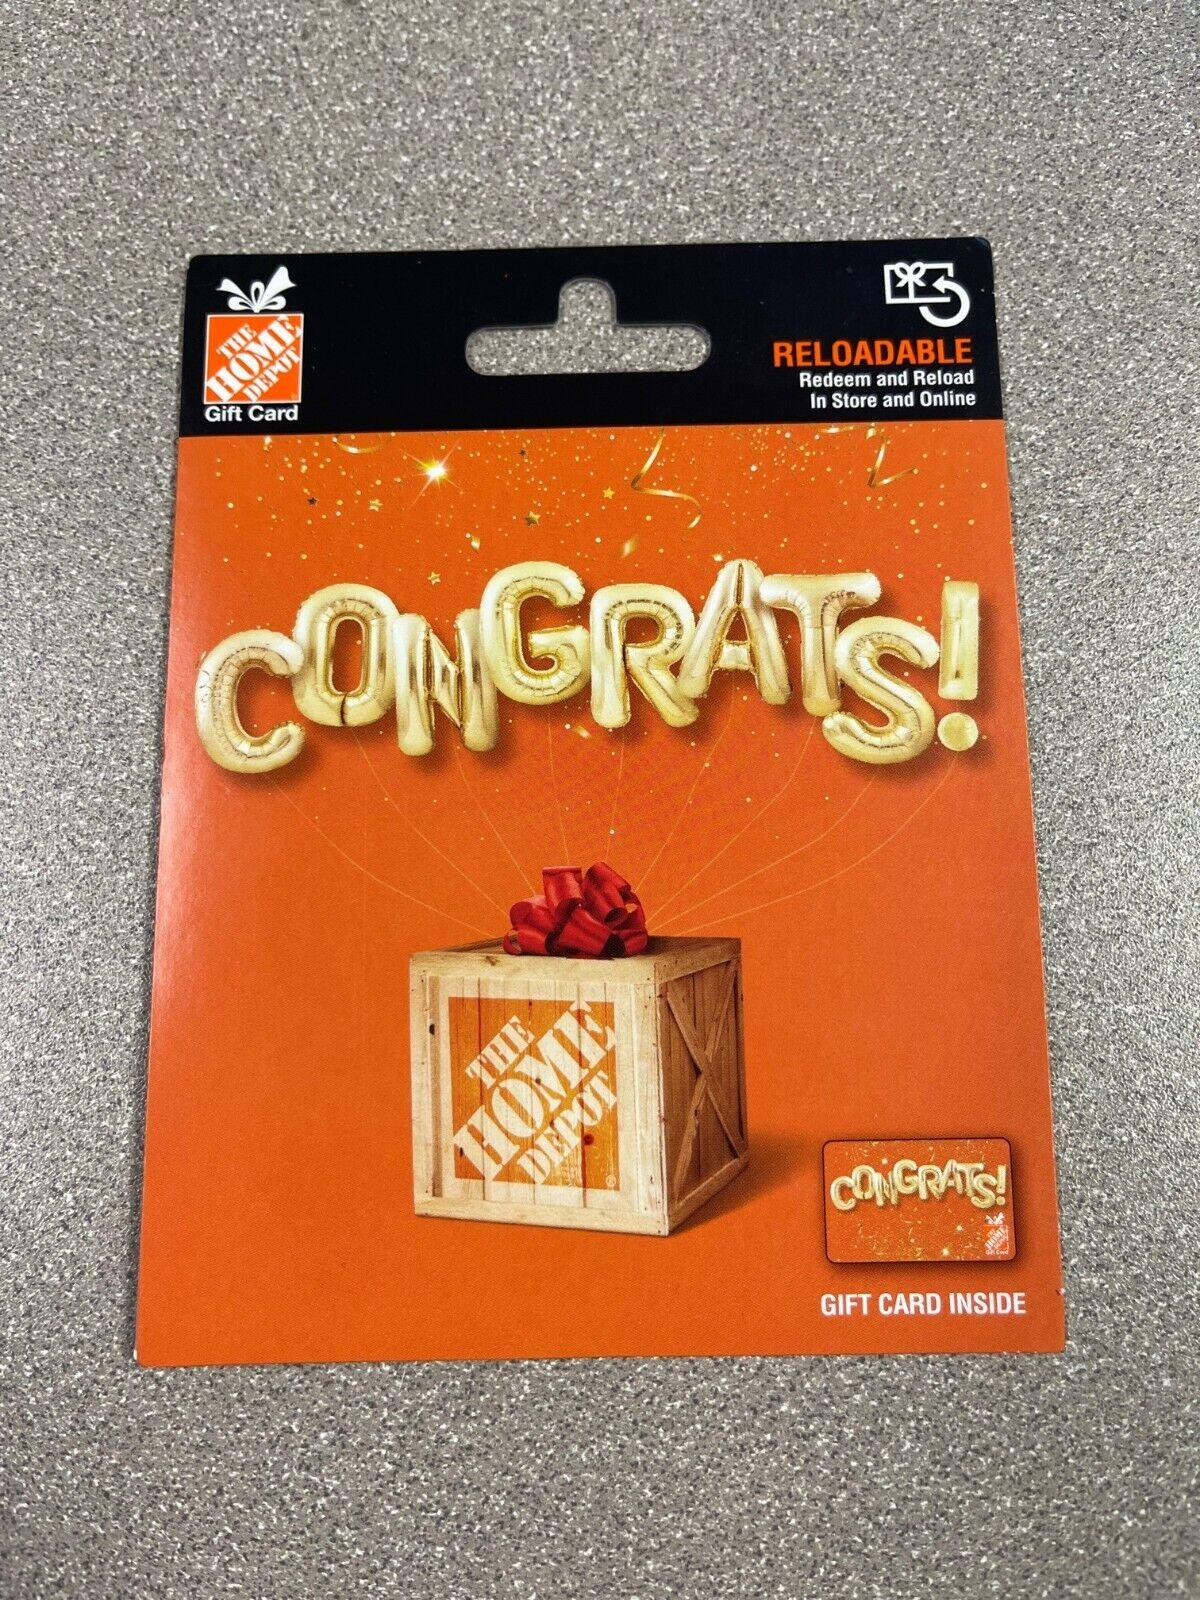 200 Home Depot Gift Card - $190.00